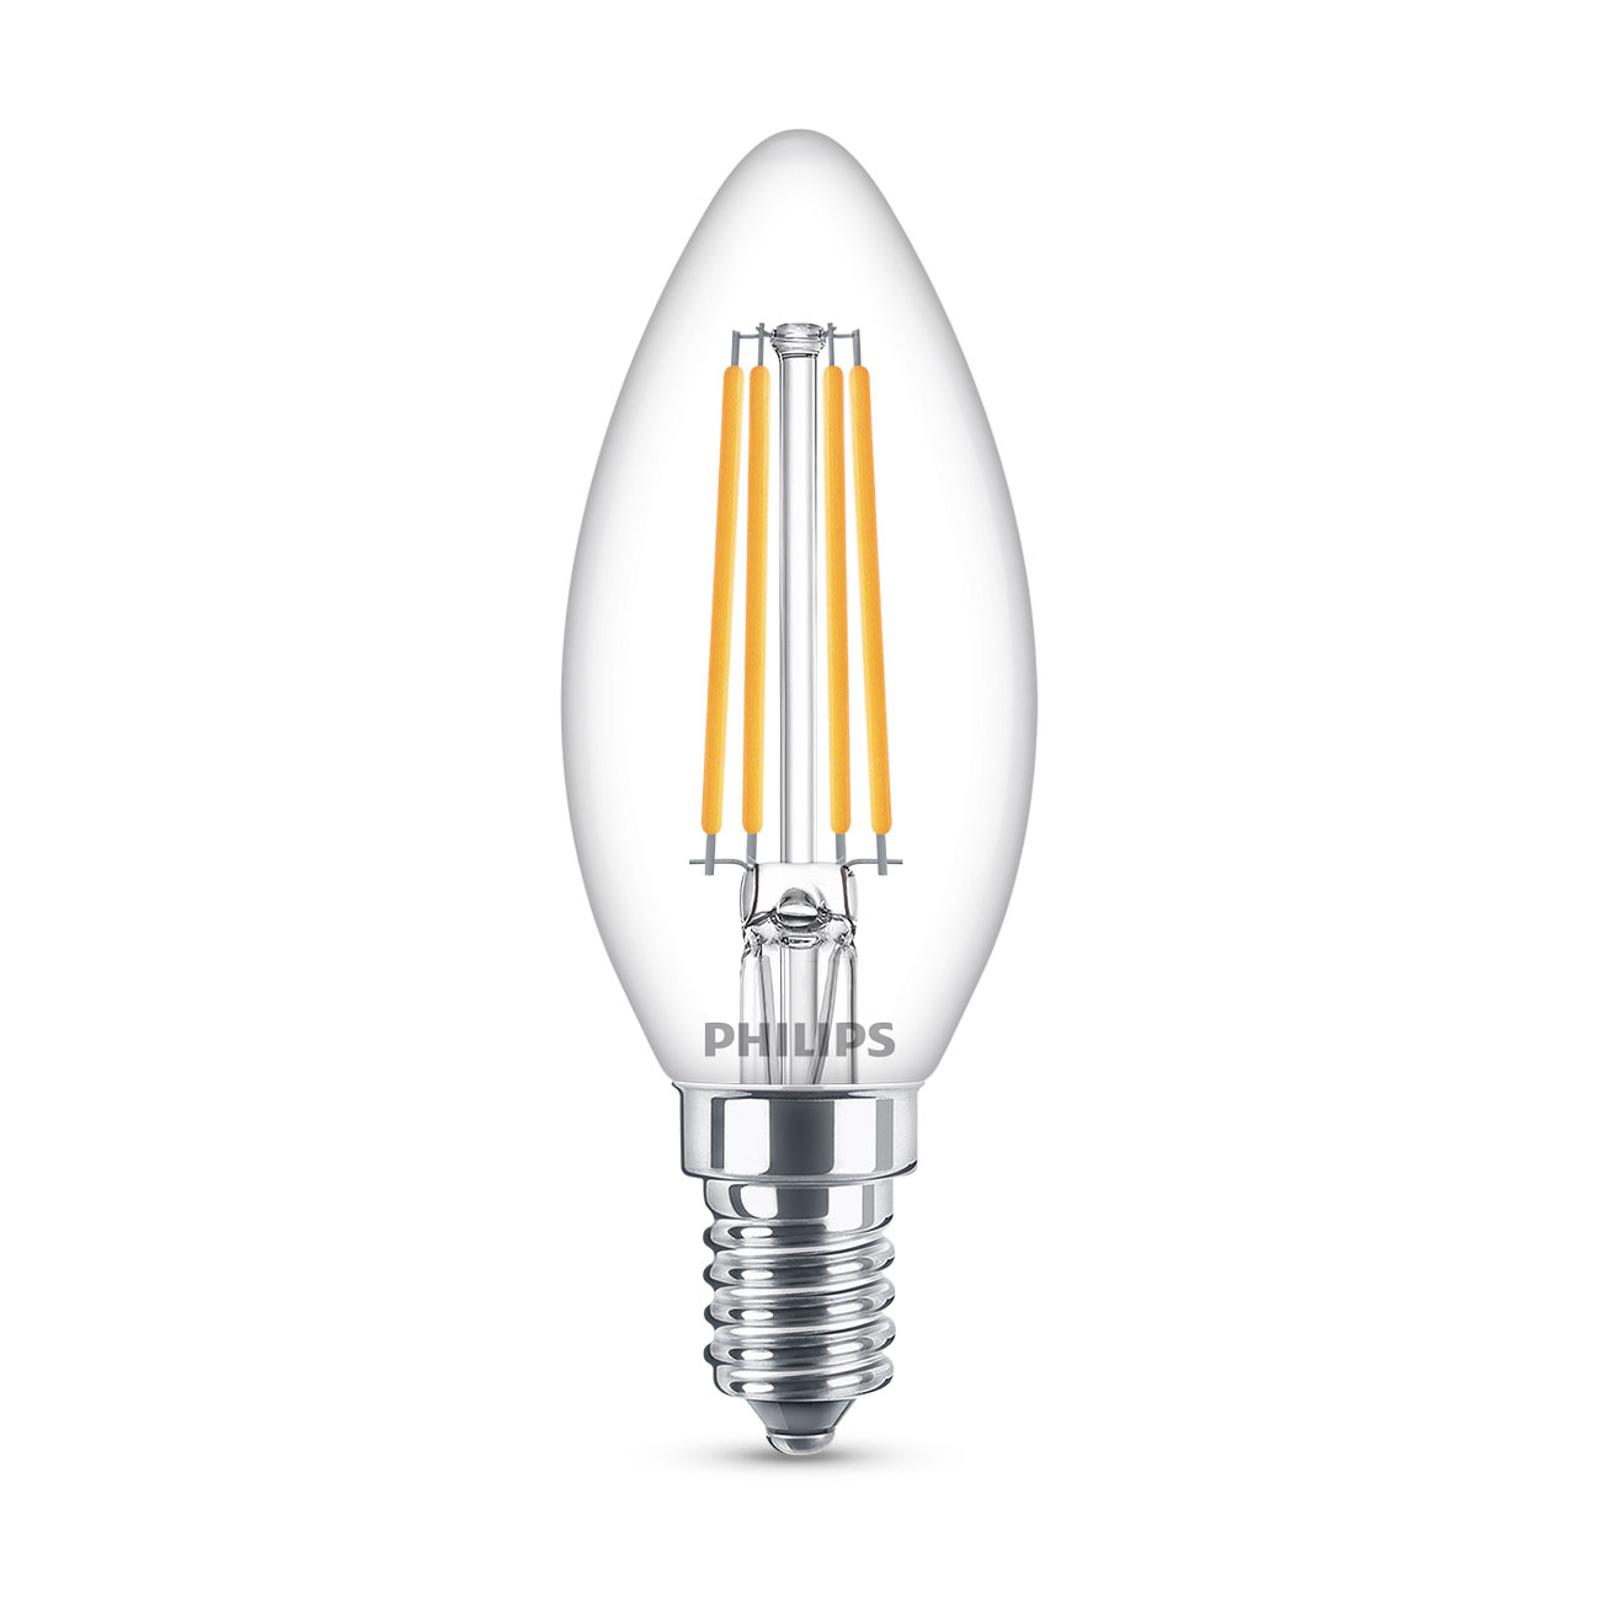 Philips Classic LED lamp E14 B35 6,5W 2700K helder